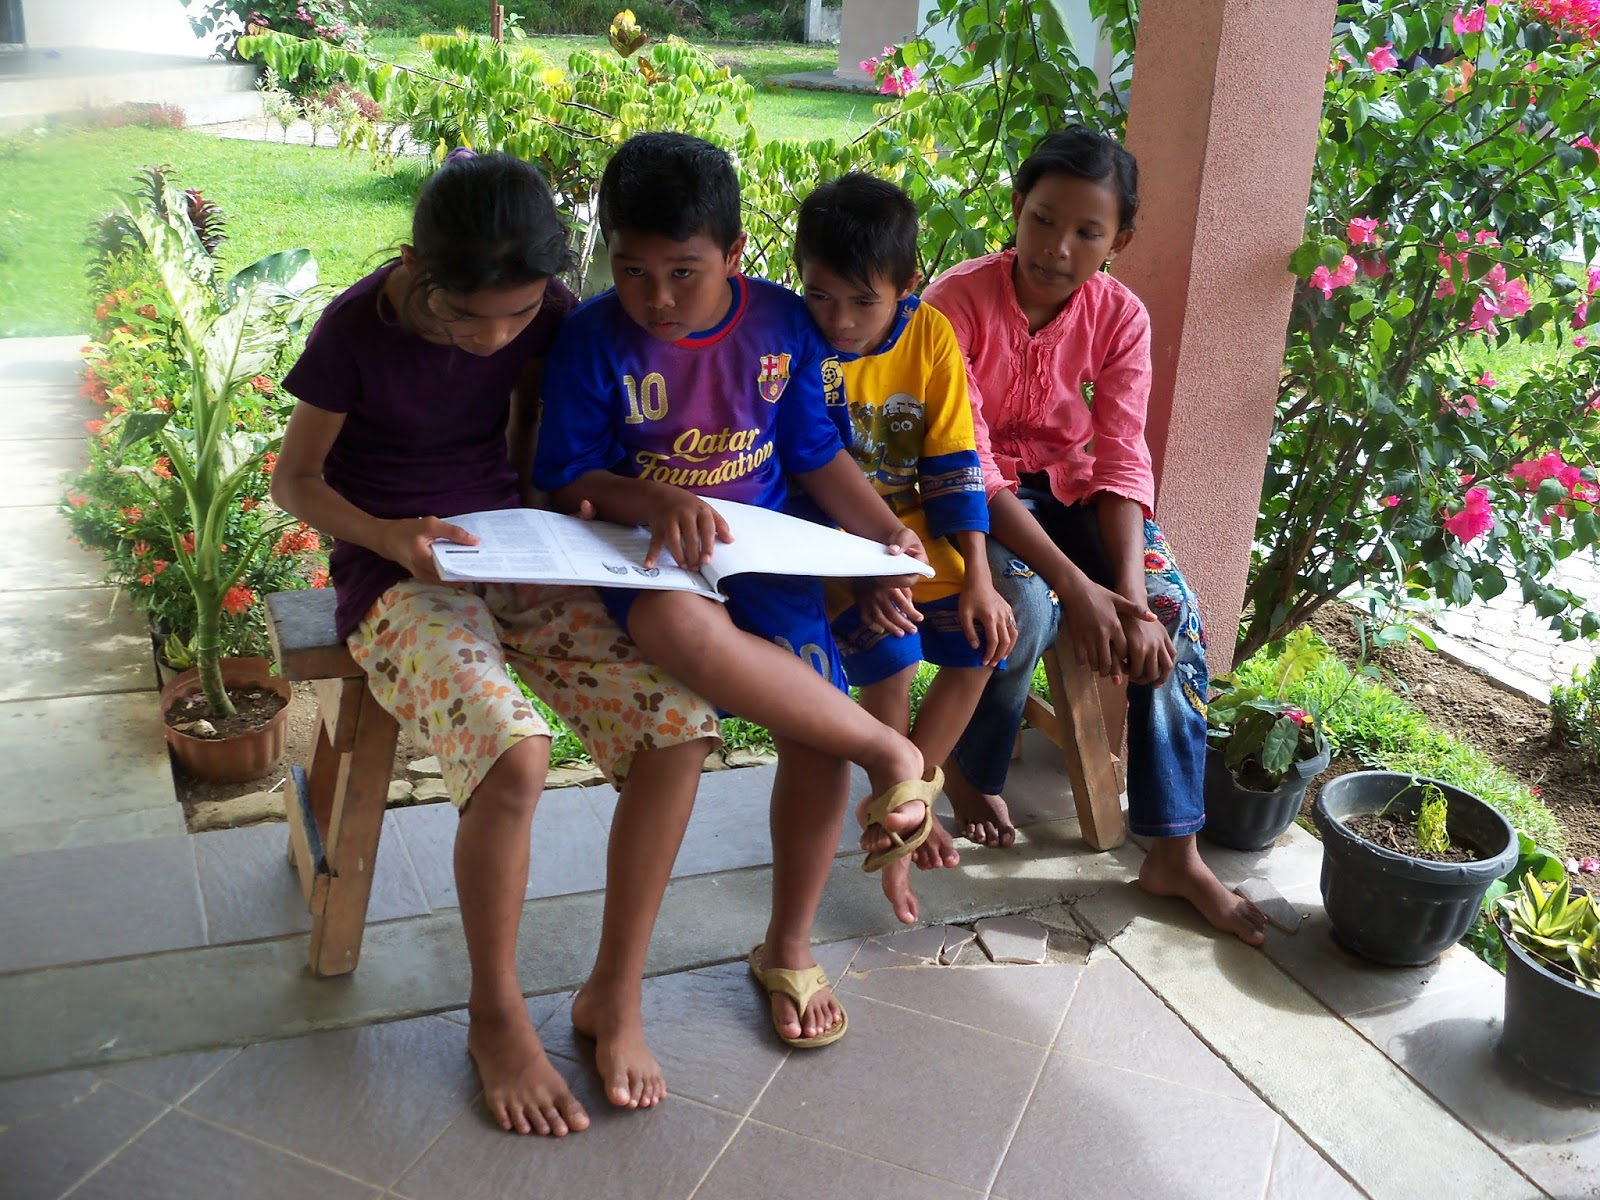 sos childrens village present - HD1600×1200